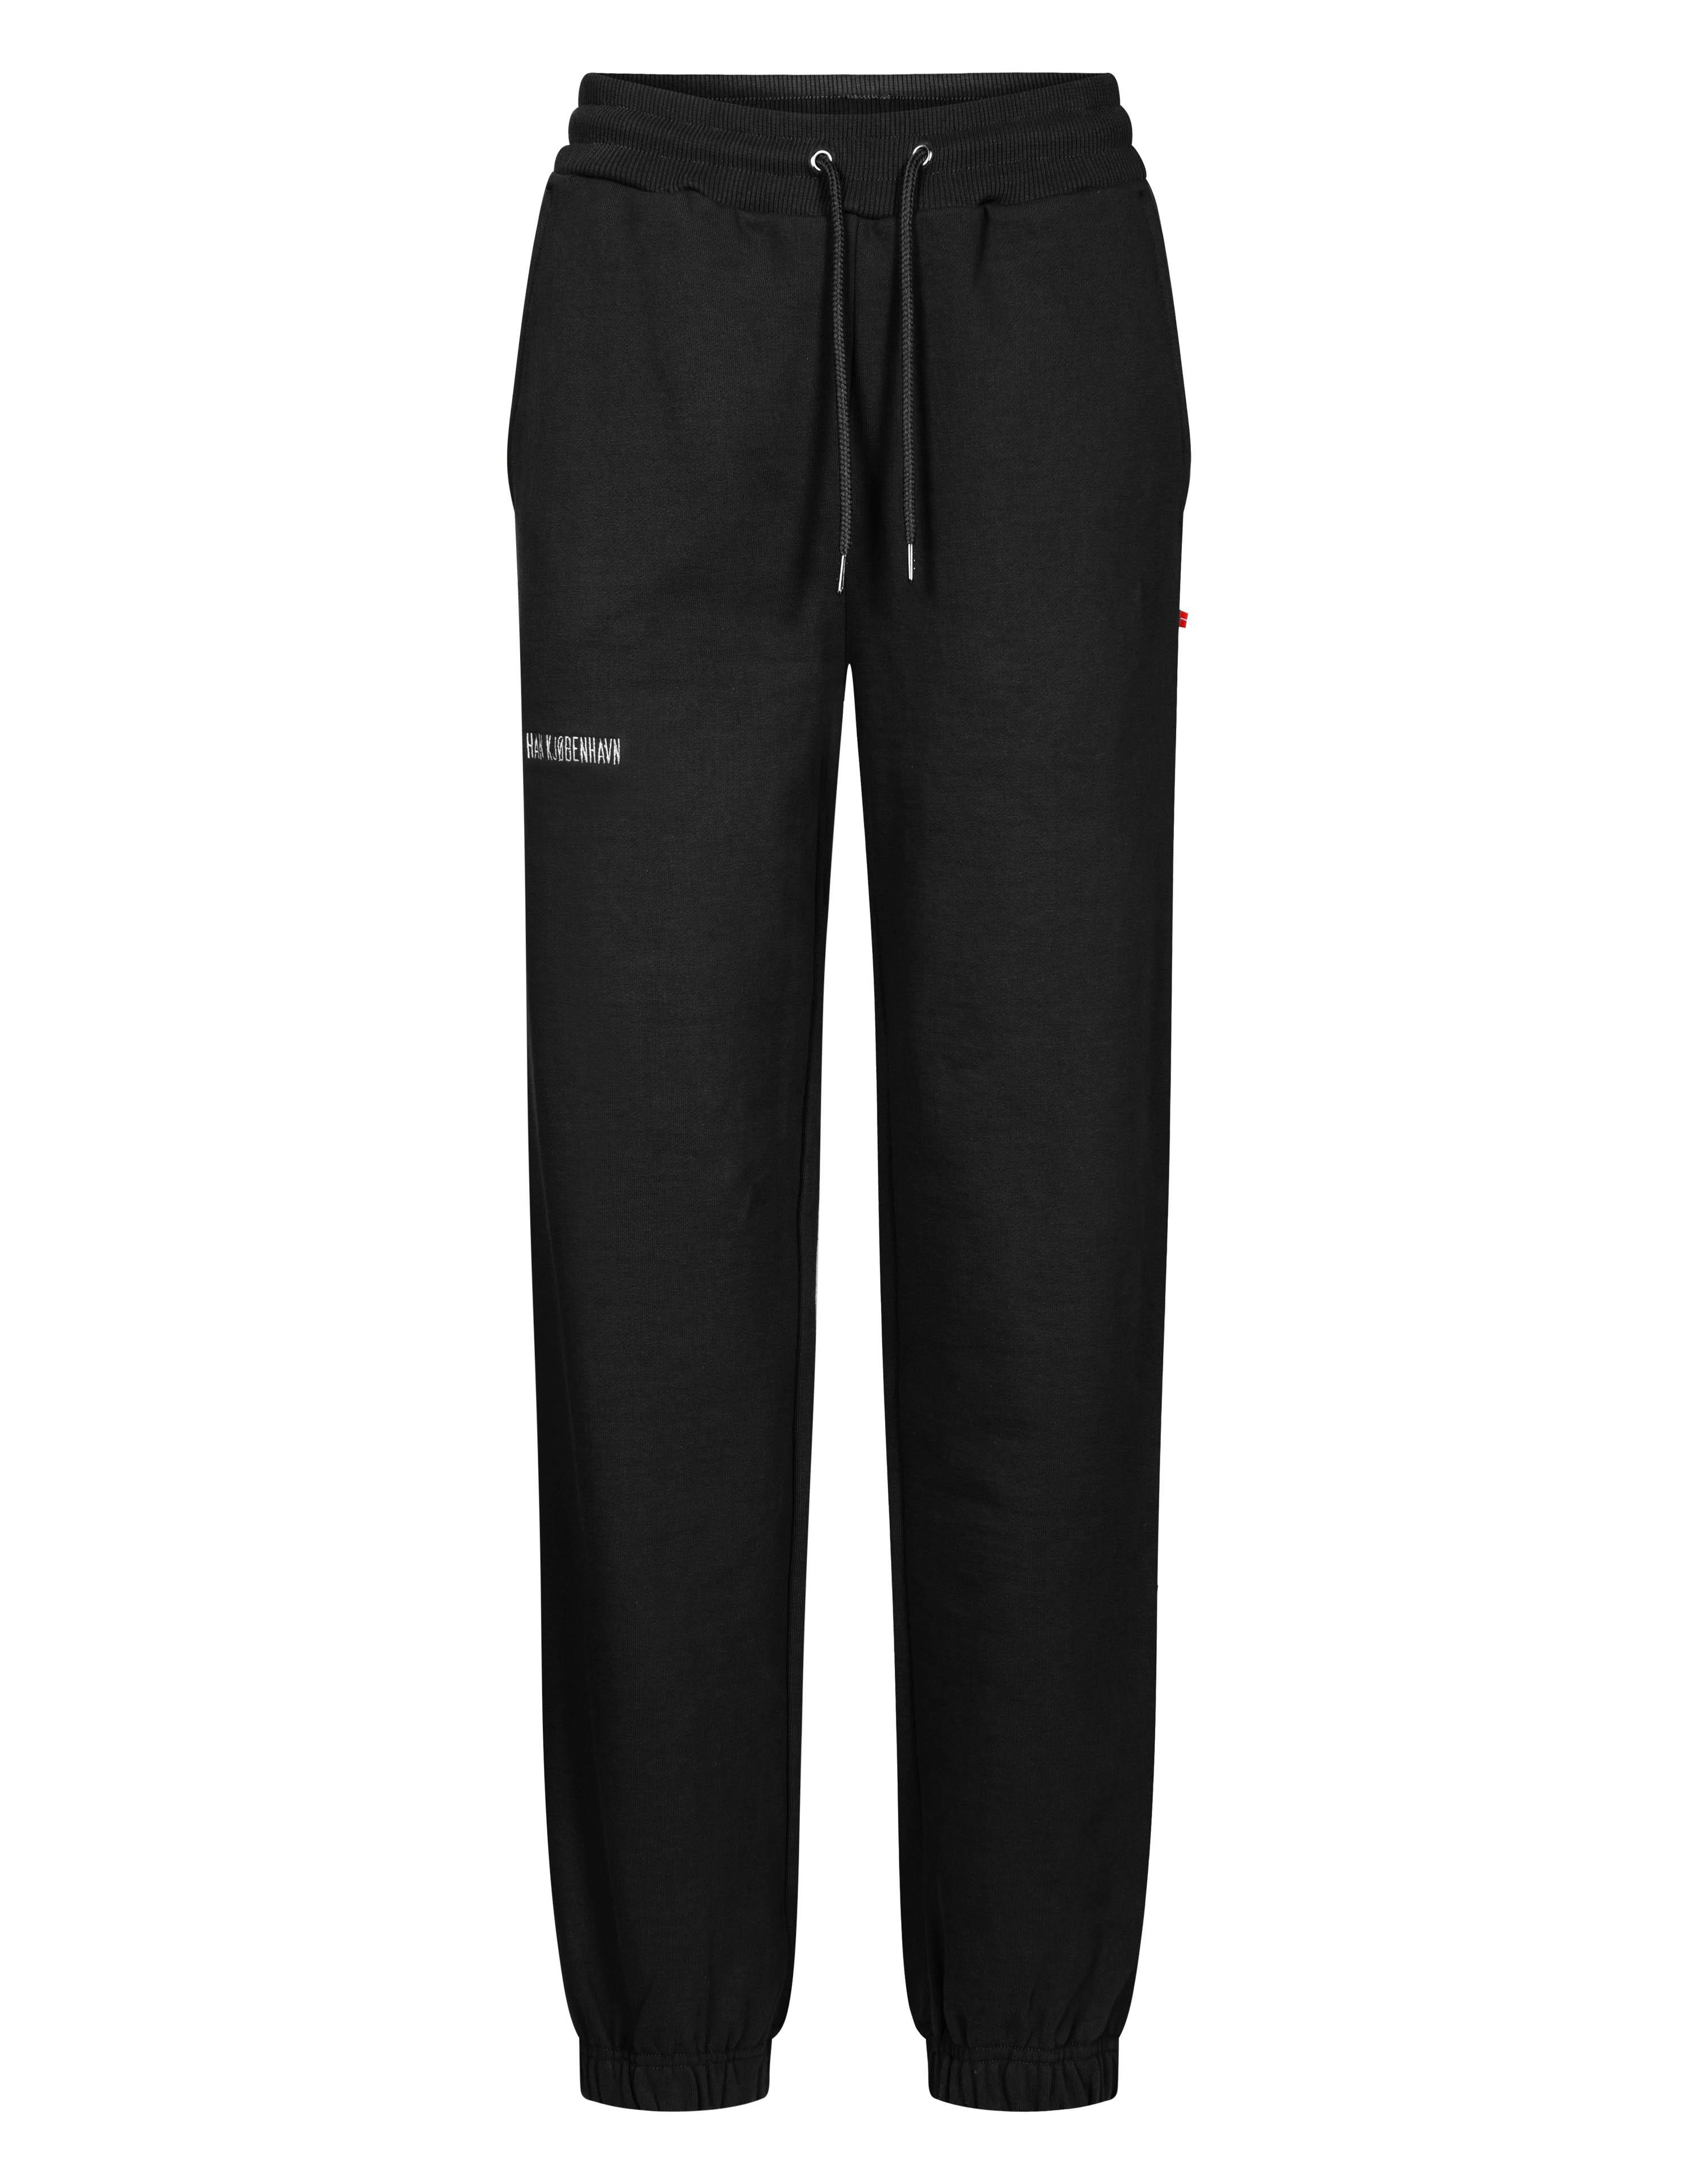 Han Kjøbenhavn sweatpants, black logo, medium